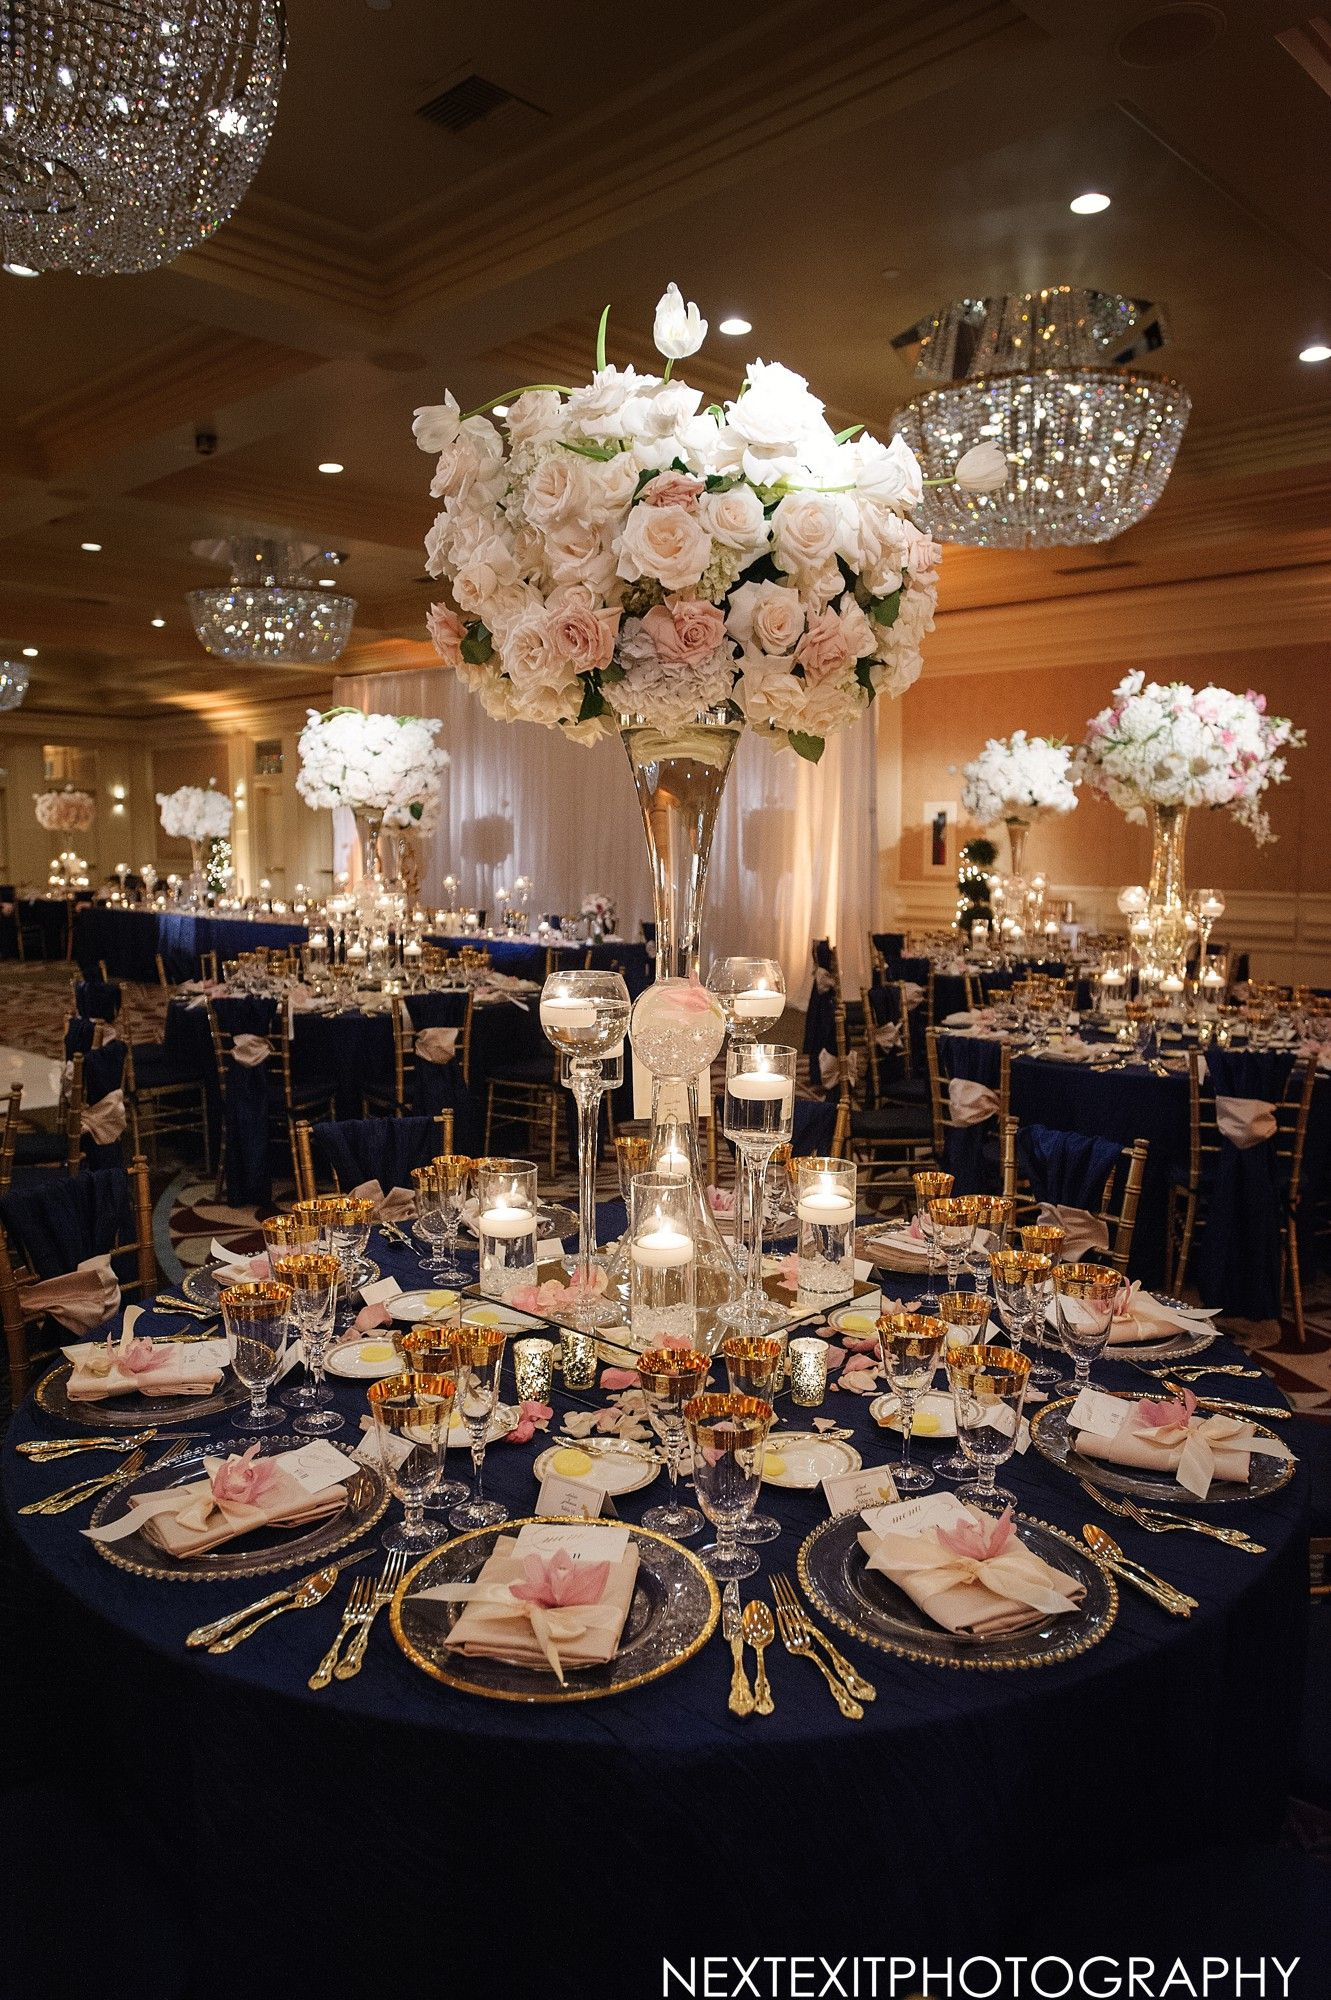 Fairmont Miramar Santa Monica Ballroom Wedding